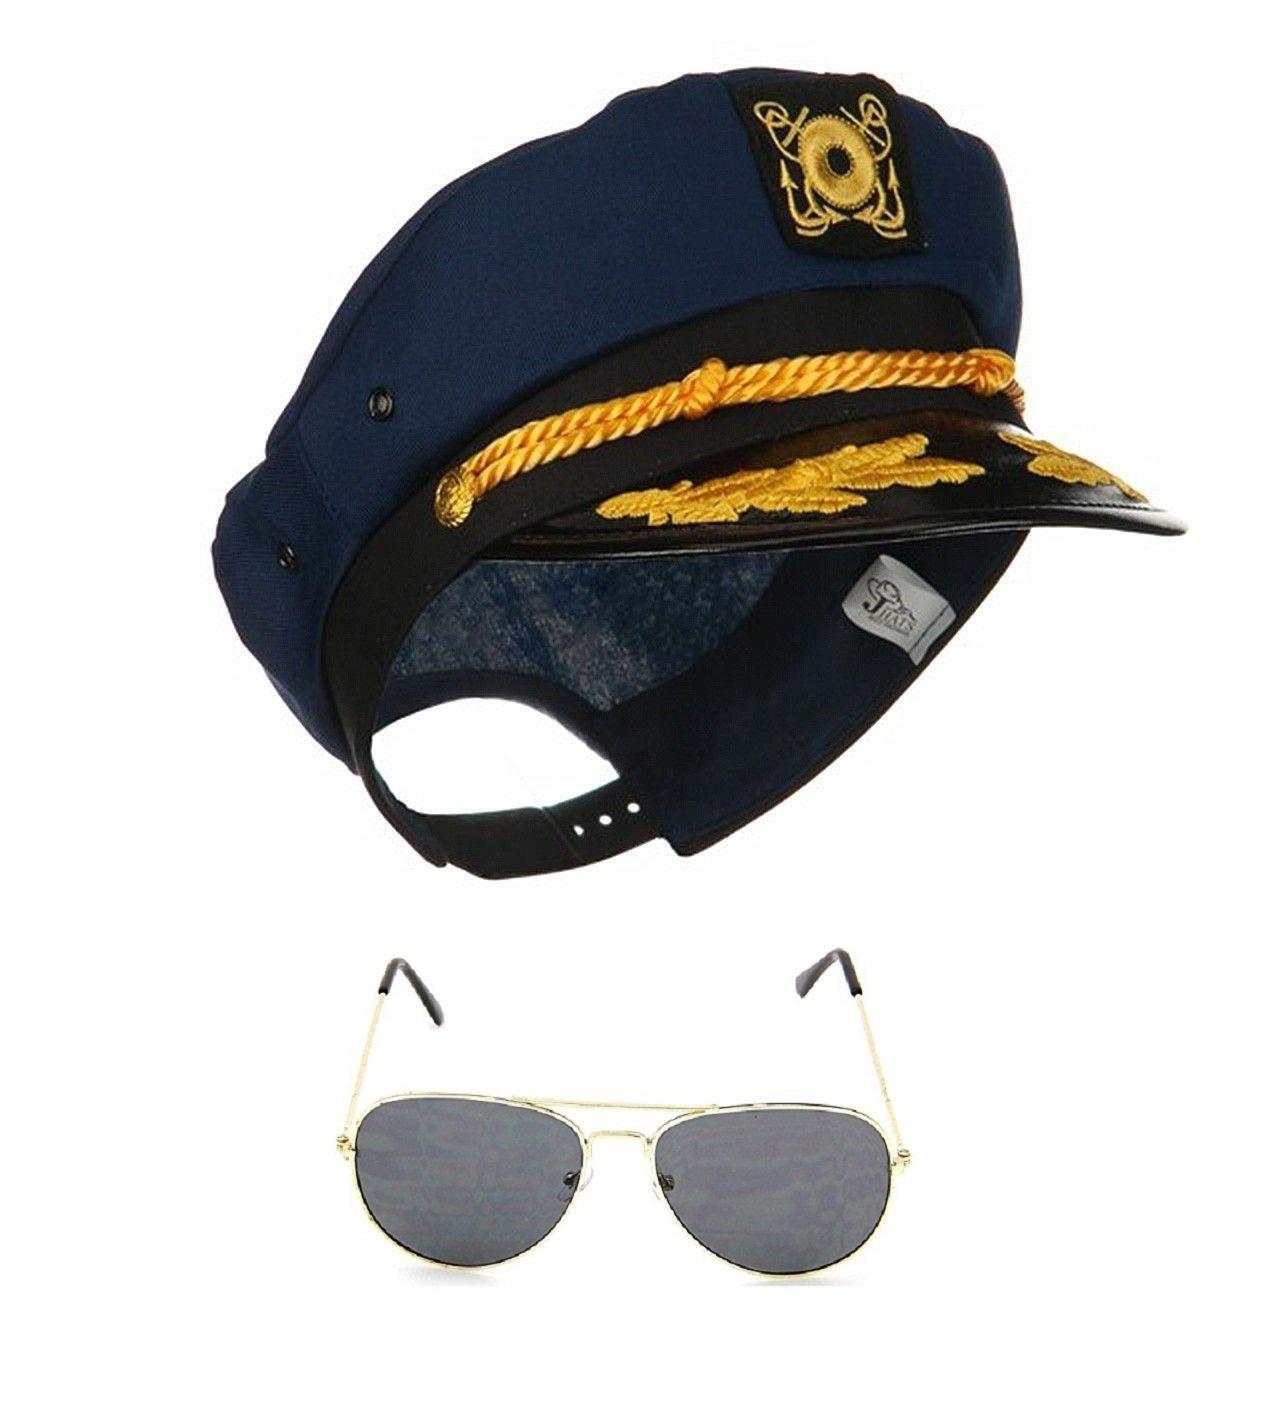 Yacht Skipper Boat Captain Hat Sailor Ship Cap Navy Blue Gold Aviator Sunglasses by Nicky Bigs Novelties (Image #2)